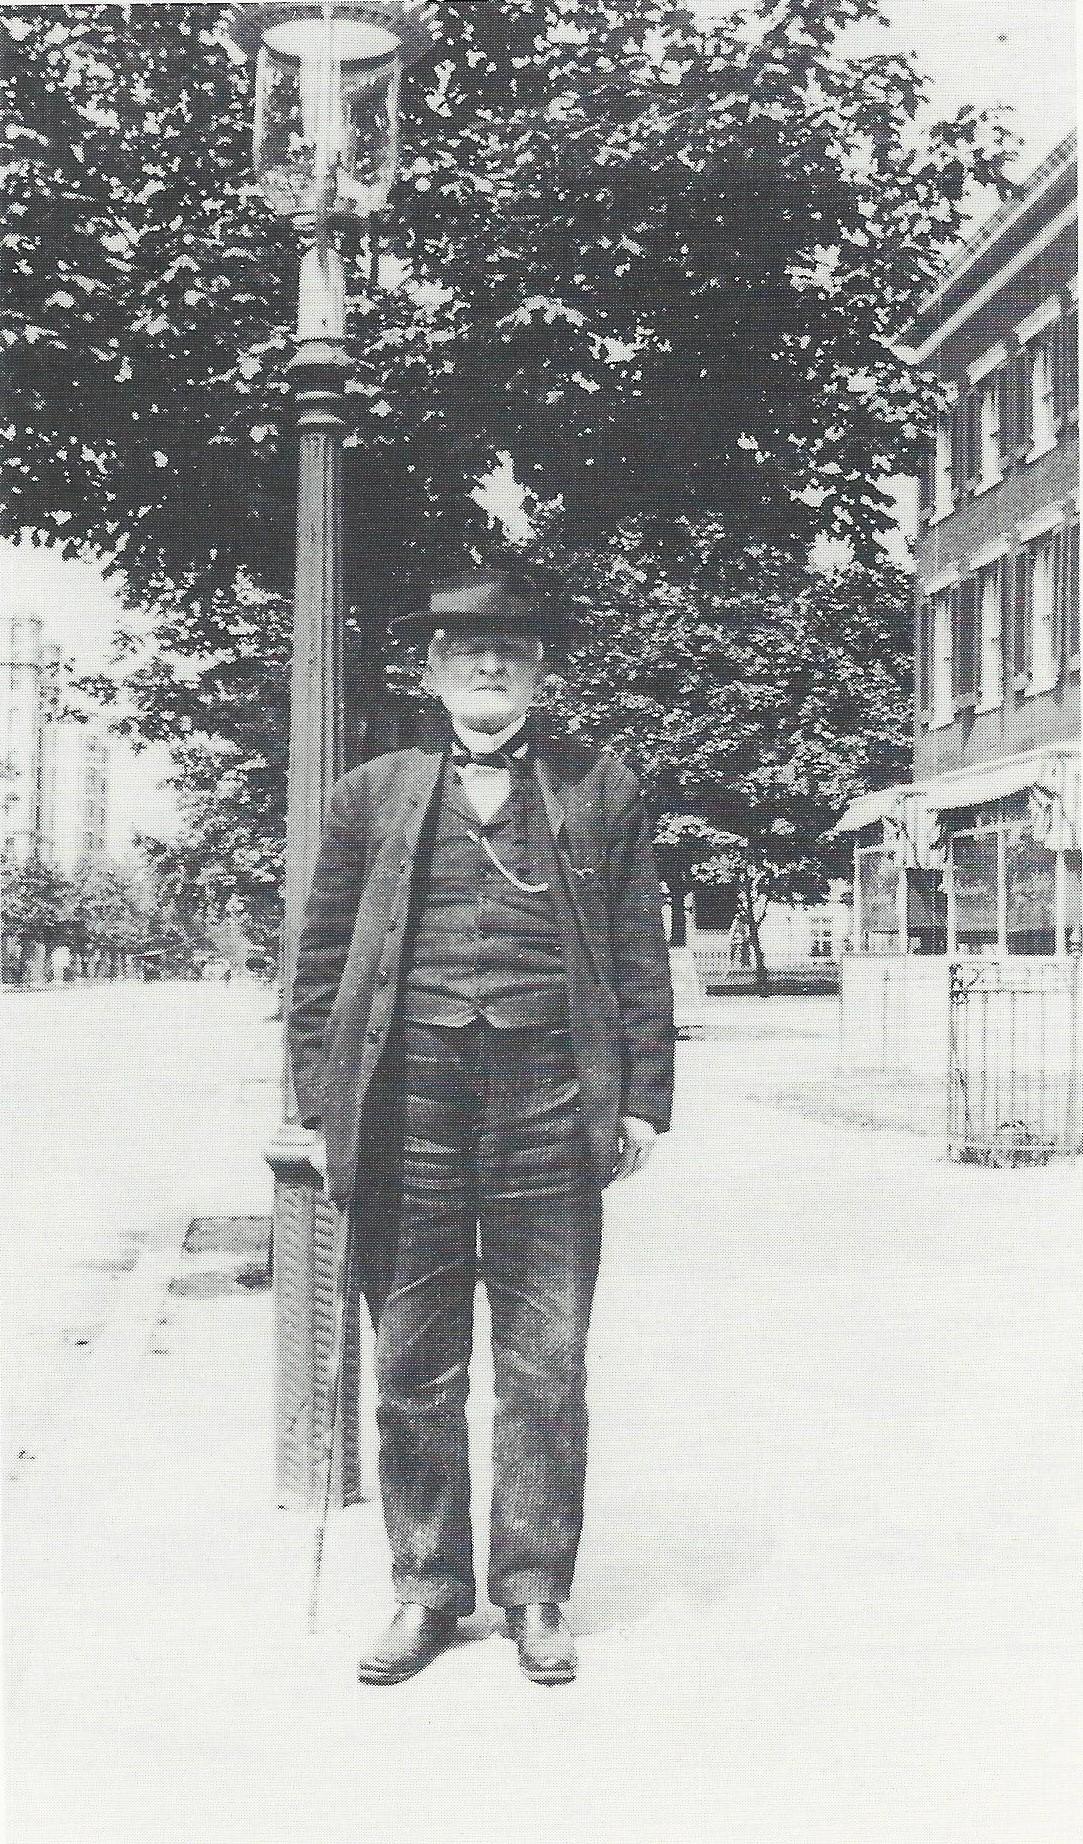 Mosby, 1910 in Washington, D.C.